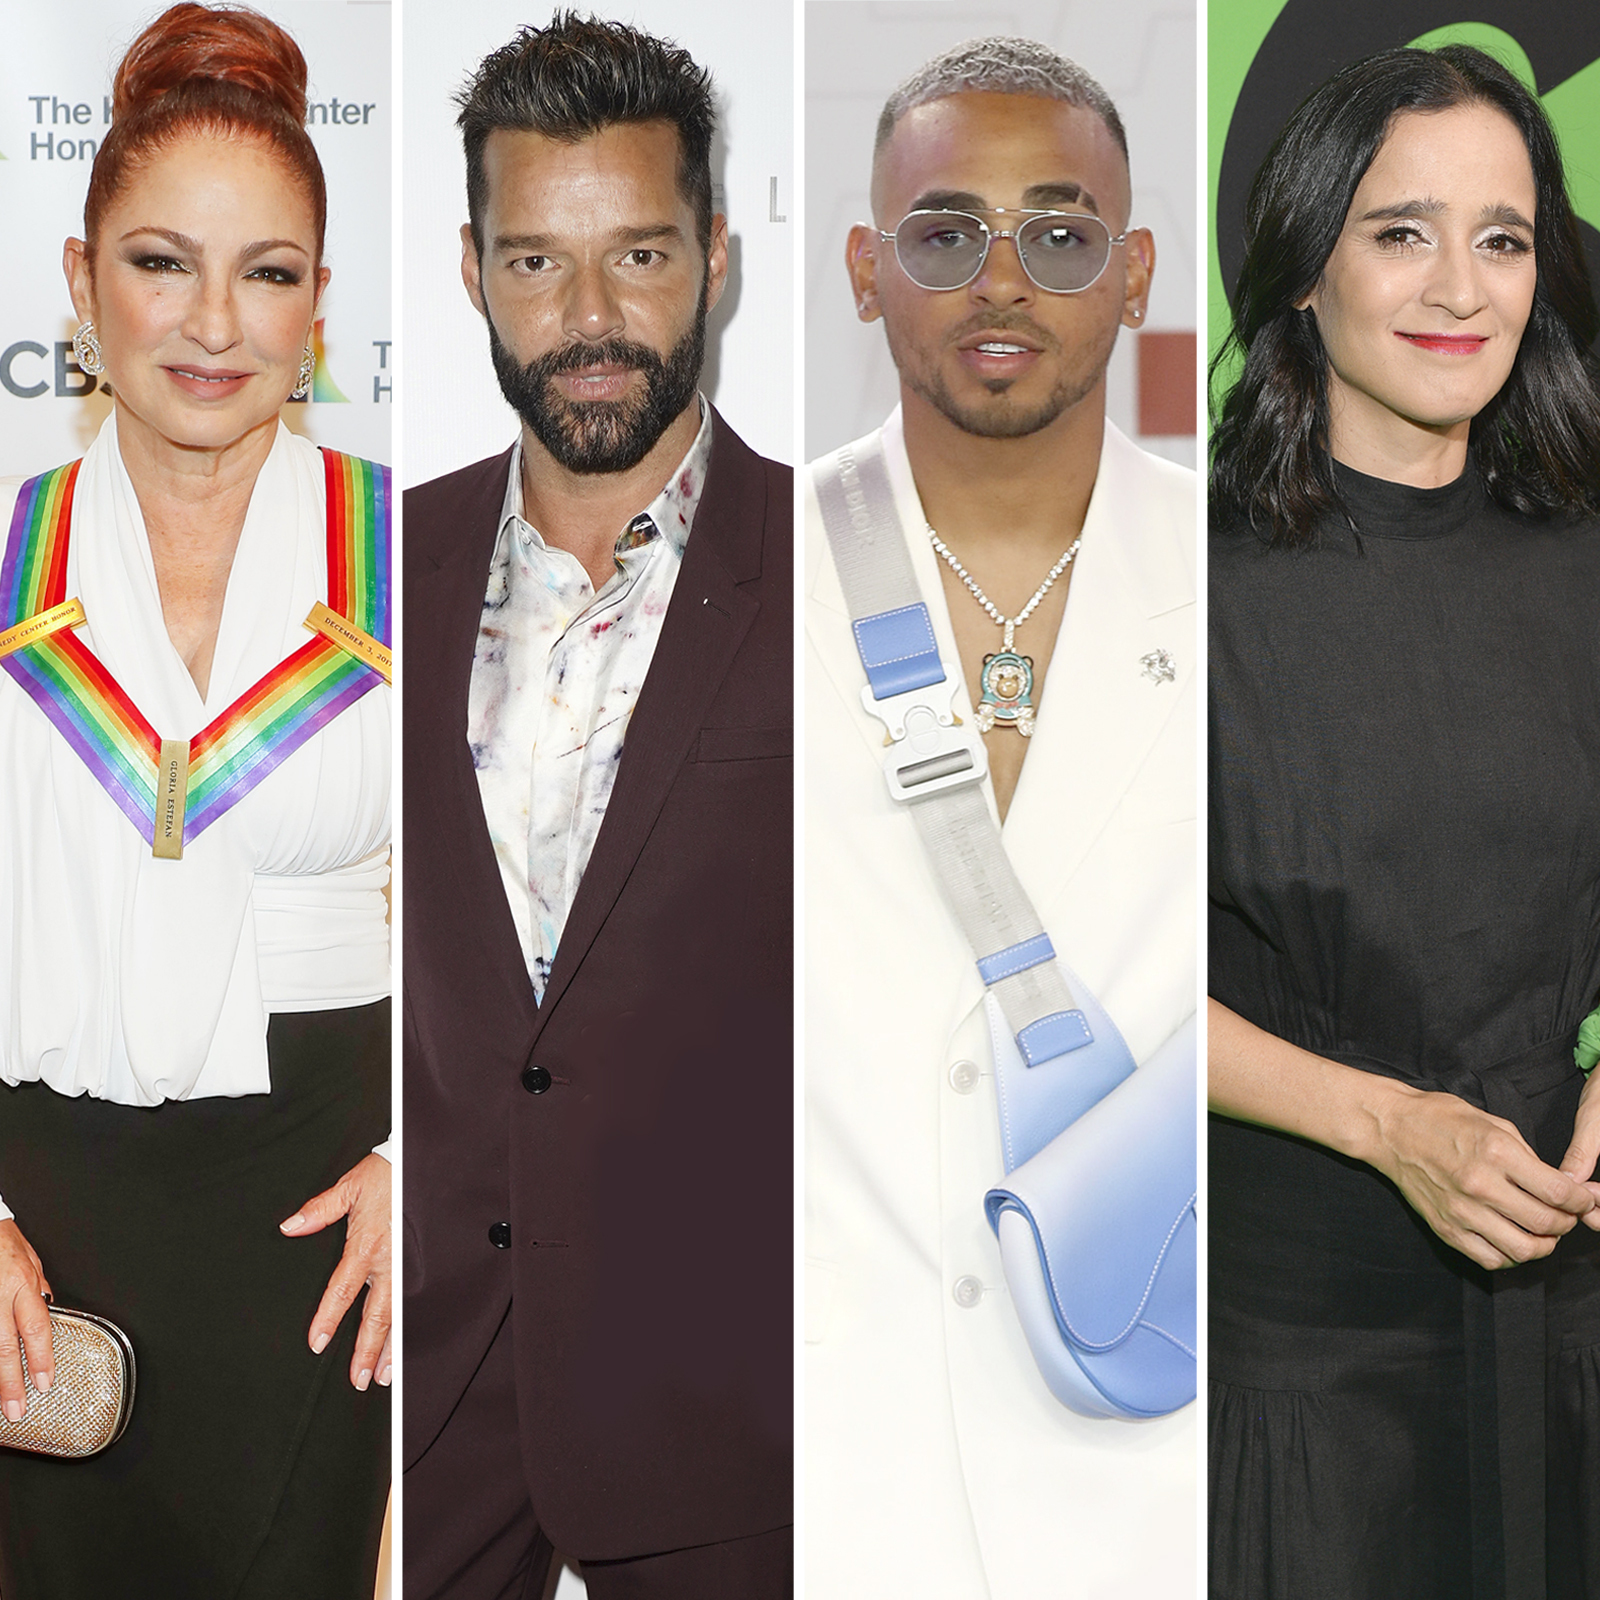 Gloria Estefan, Ricky Martin, Ozuna, Julieta Venegas